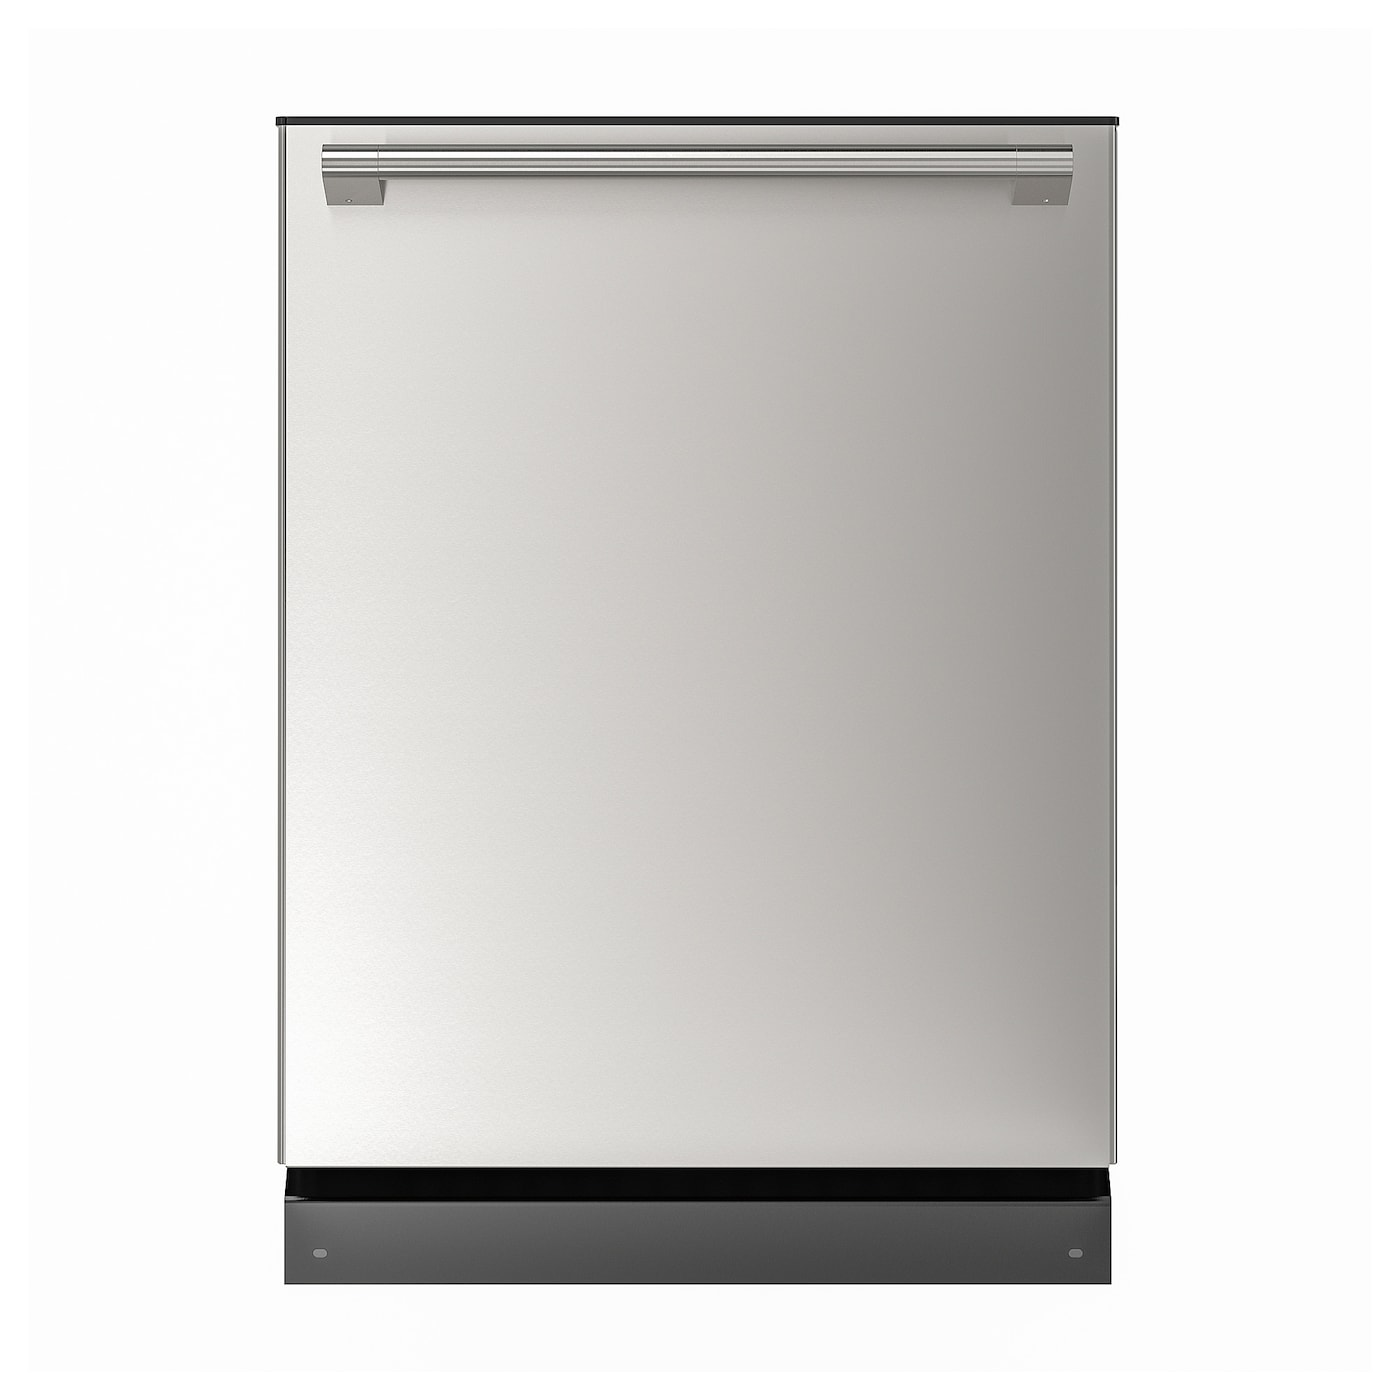 Ikea ESSENTIELL Built-in dishwasher, Stainless steel